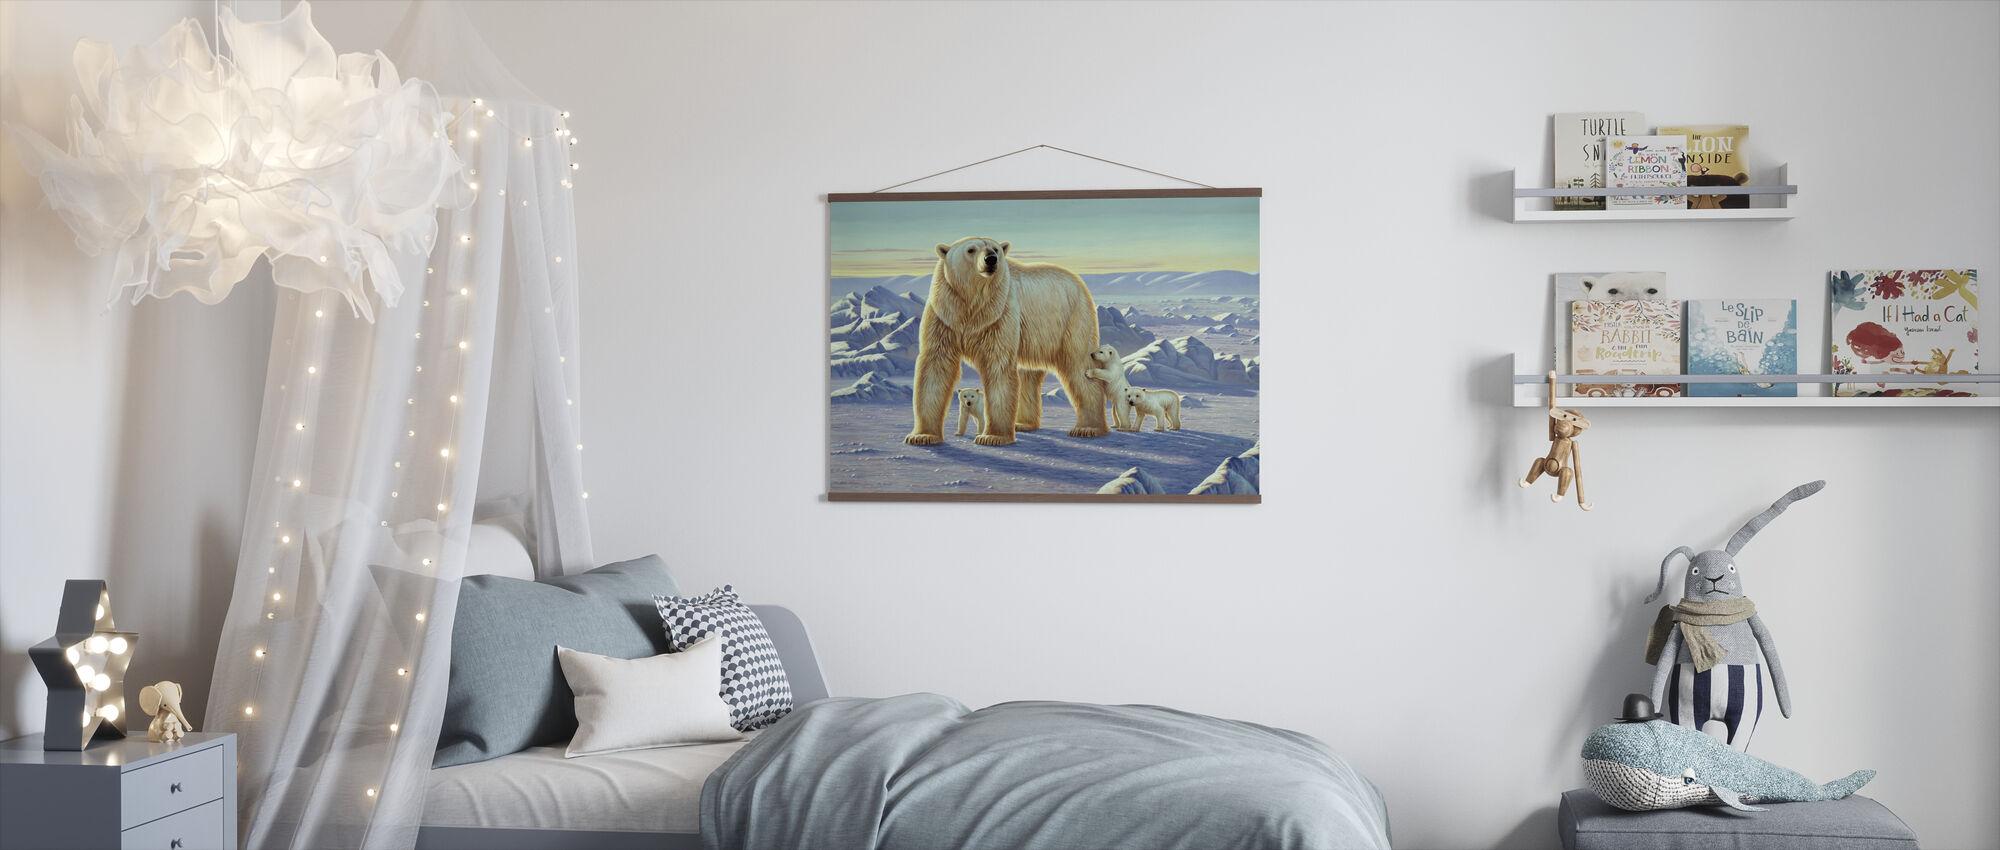 Polar Bear with Cubs - Poster - Kids Room